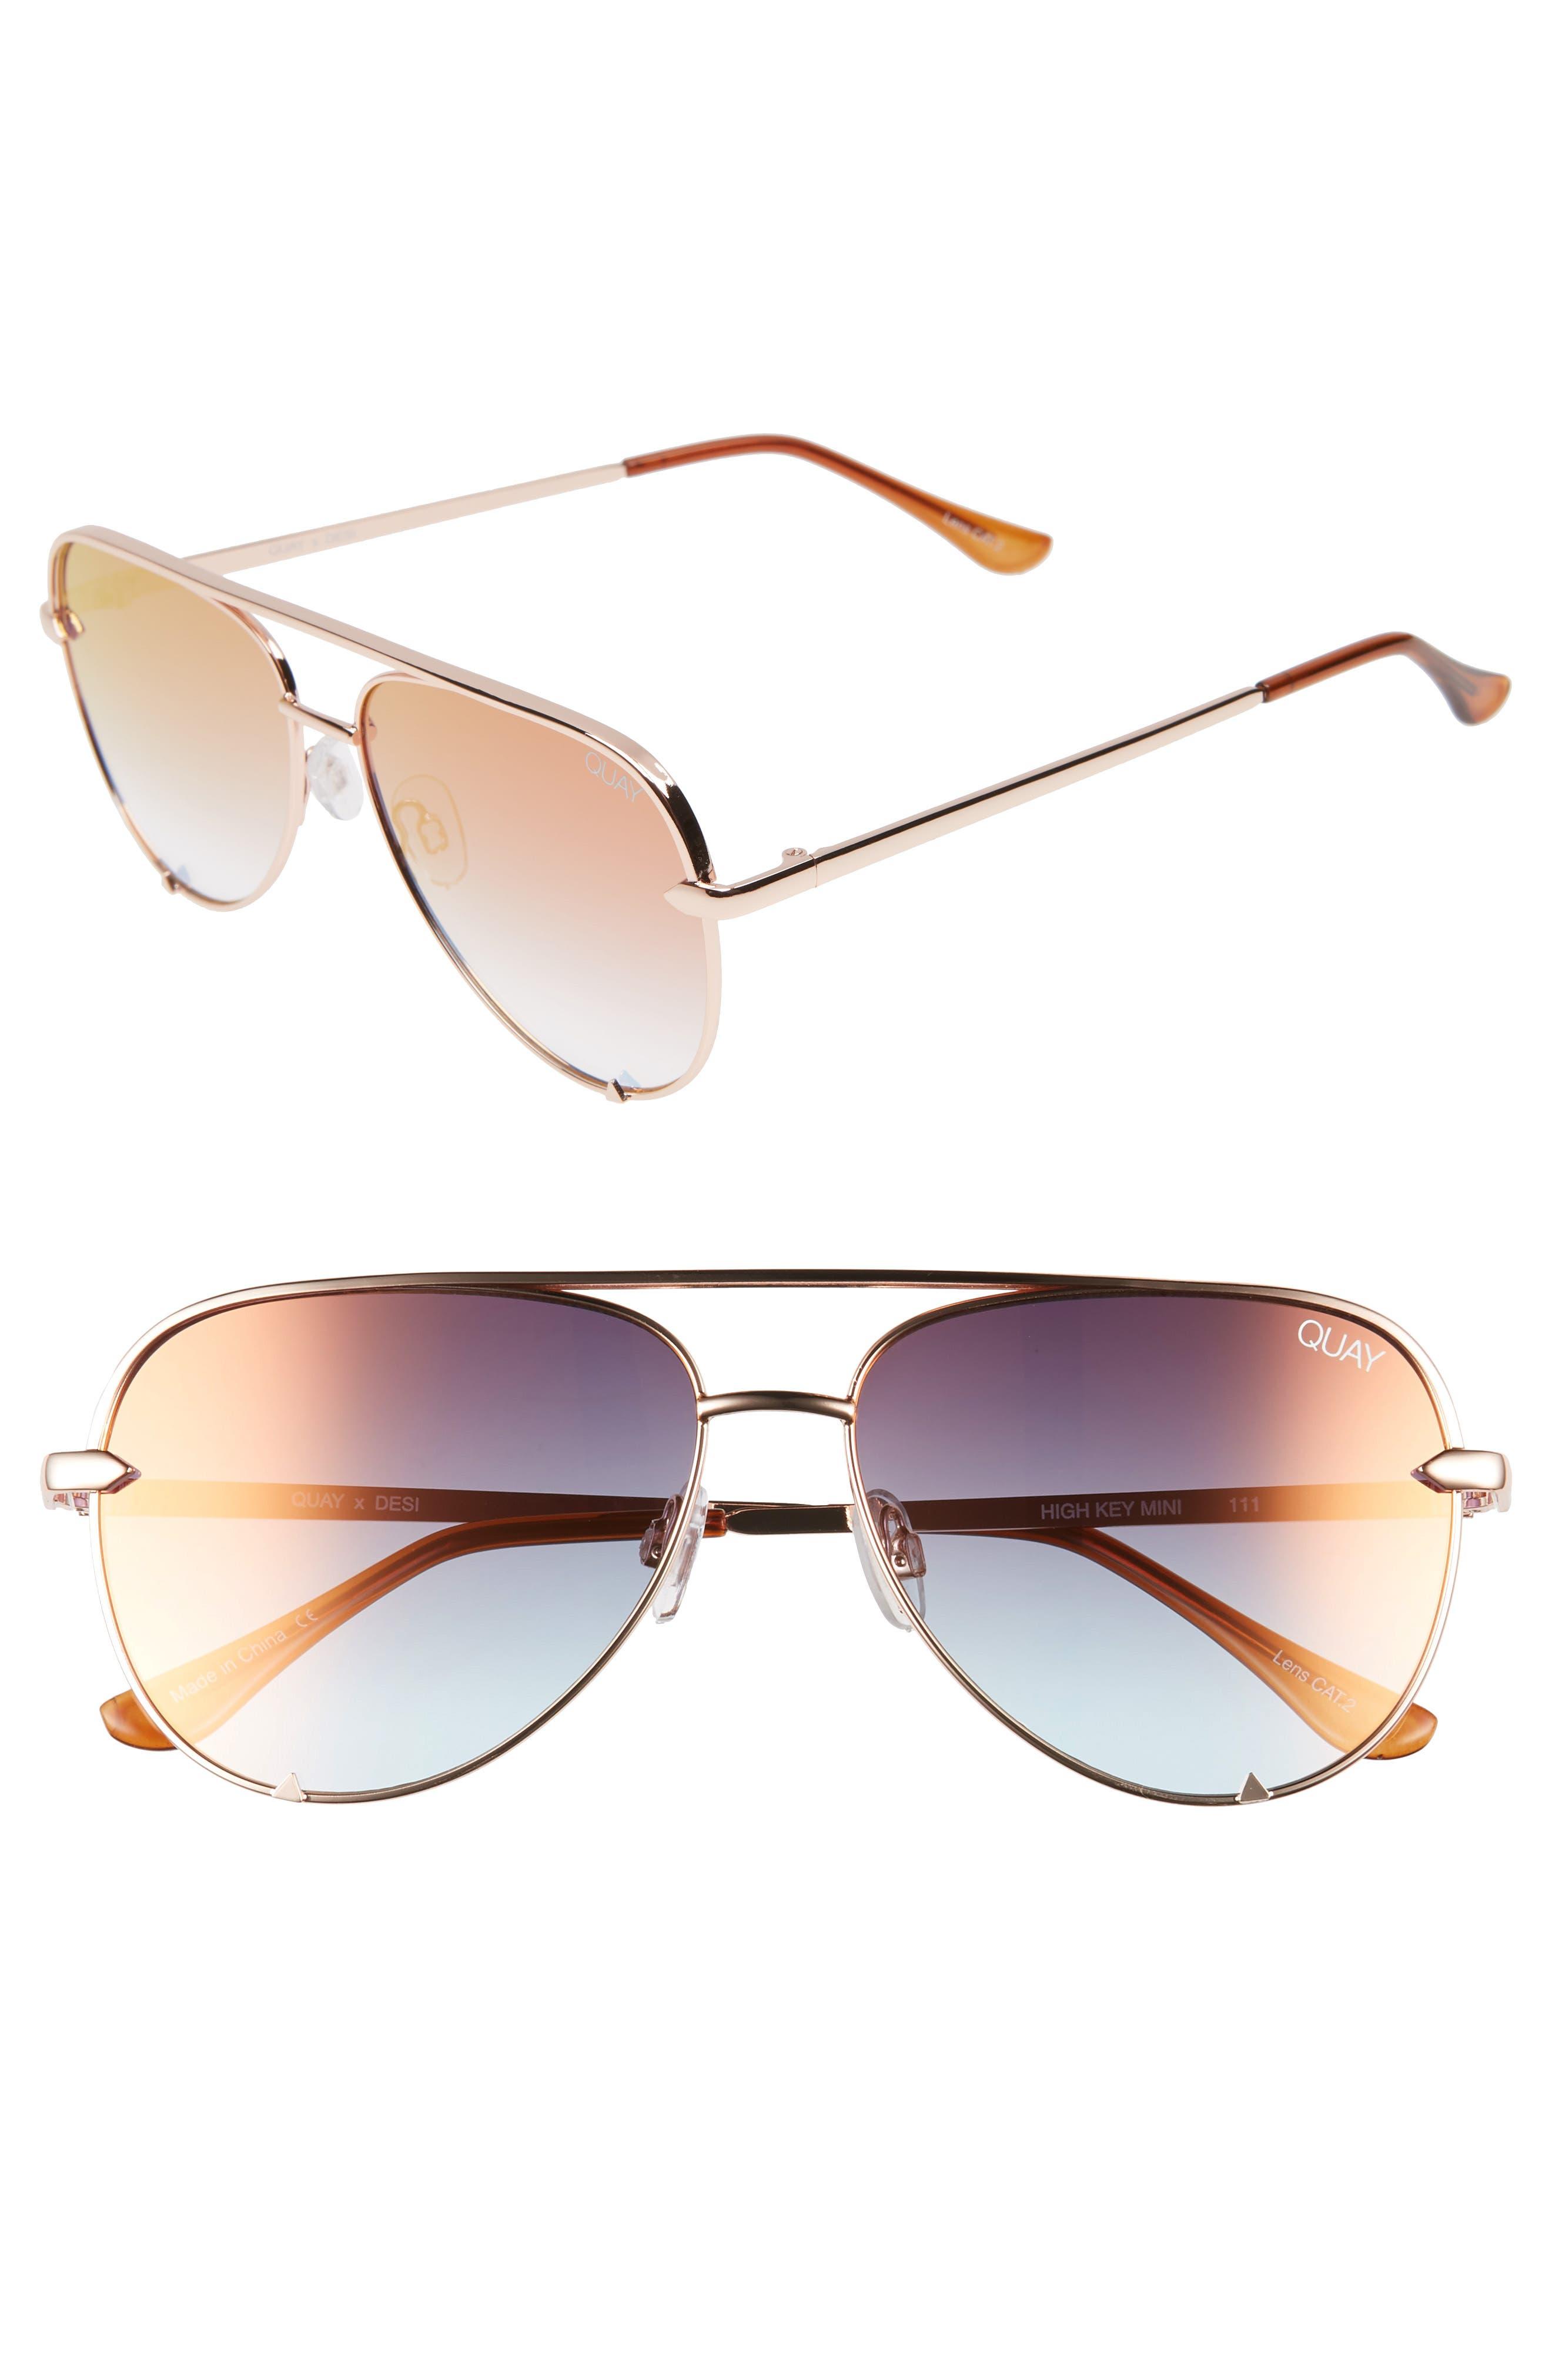 2a371747dd3f0 Quay Australia Aviator Sunglasses